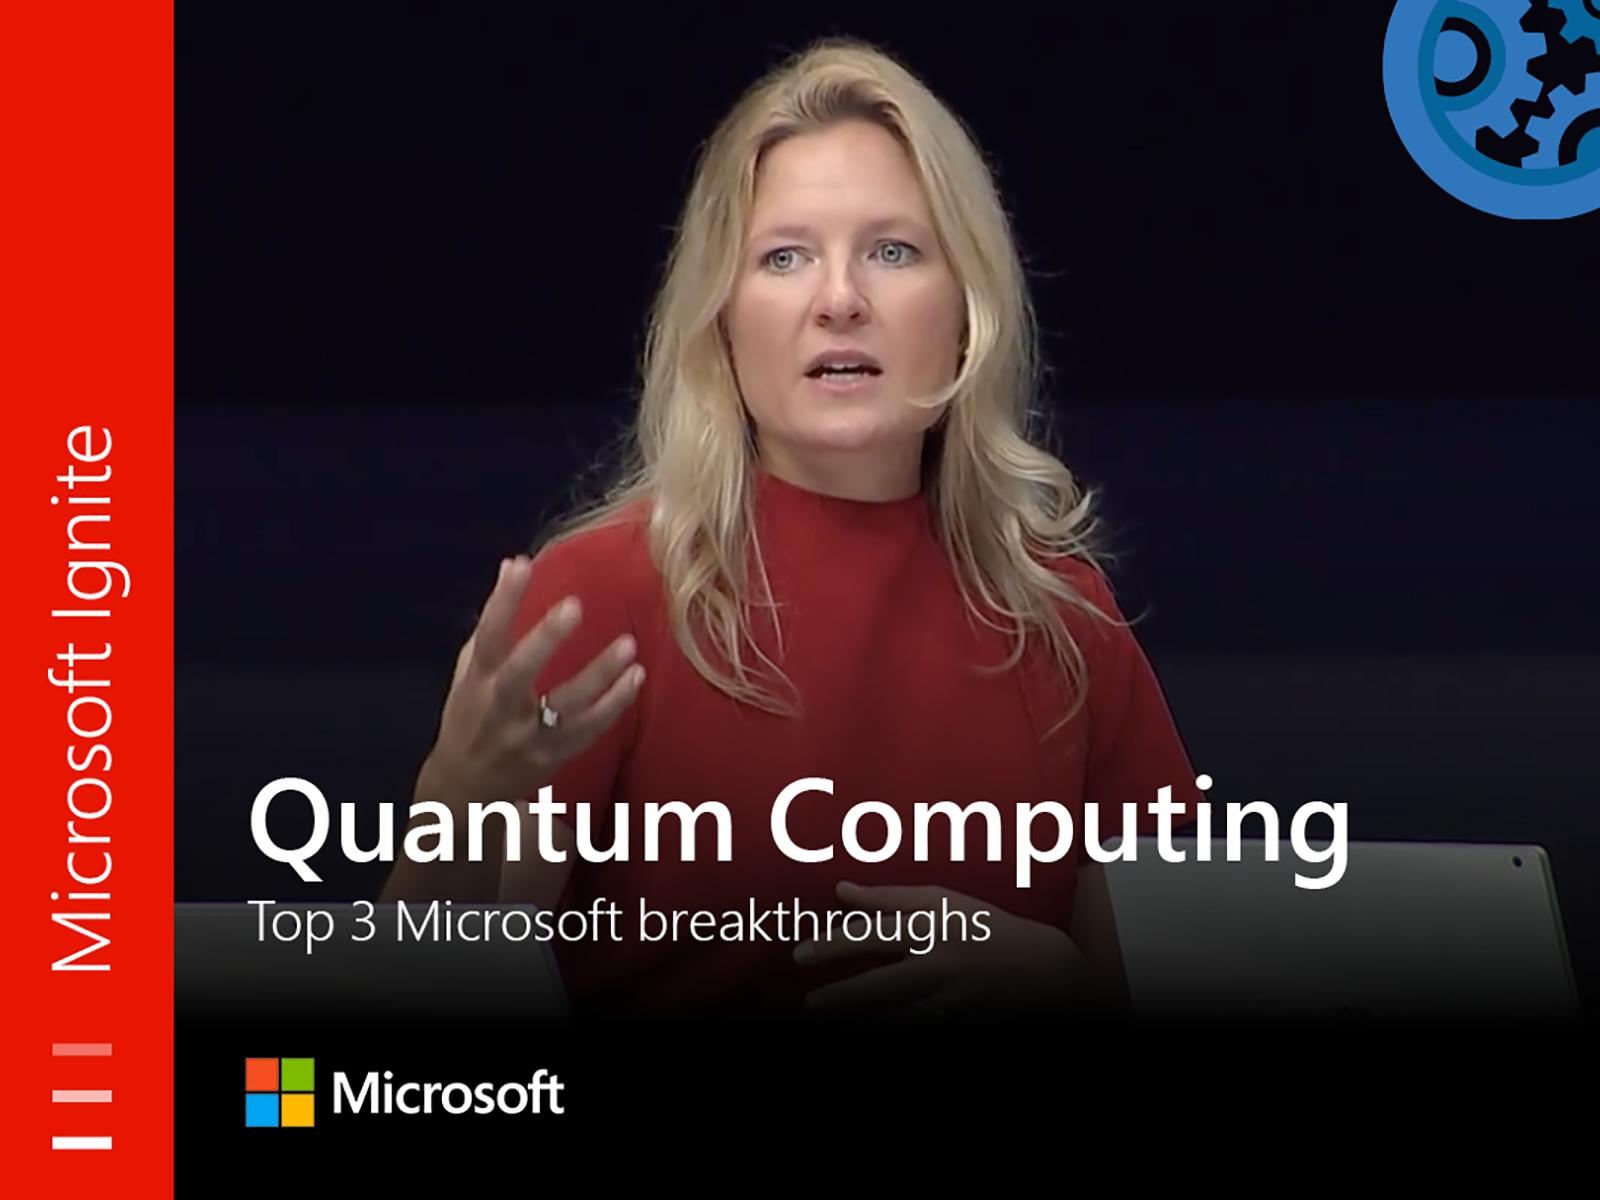 Artwork for Quantum Computing